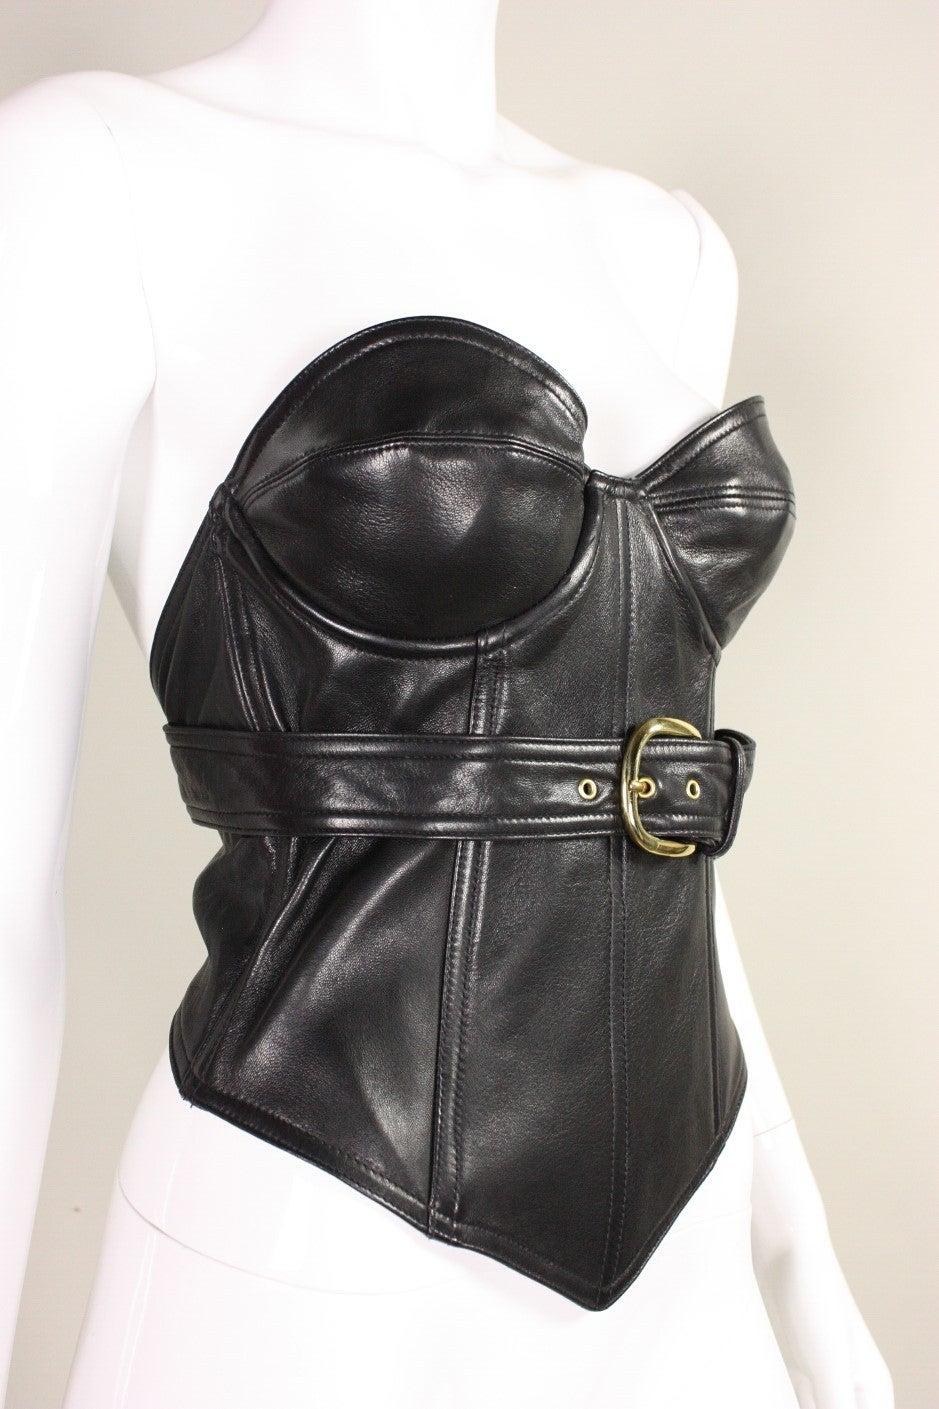 1990 39 S Isaac Mizrahi Black Leather Bustier At 1stdibs